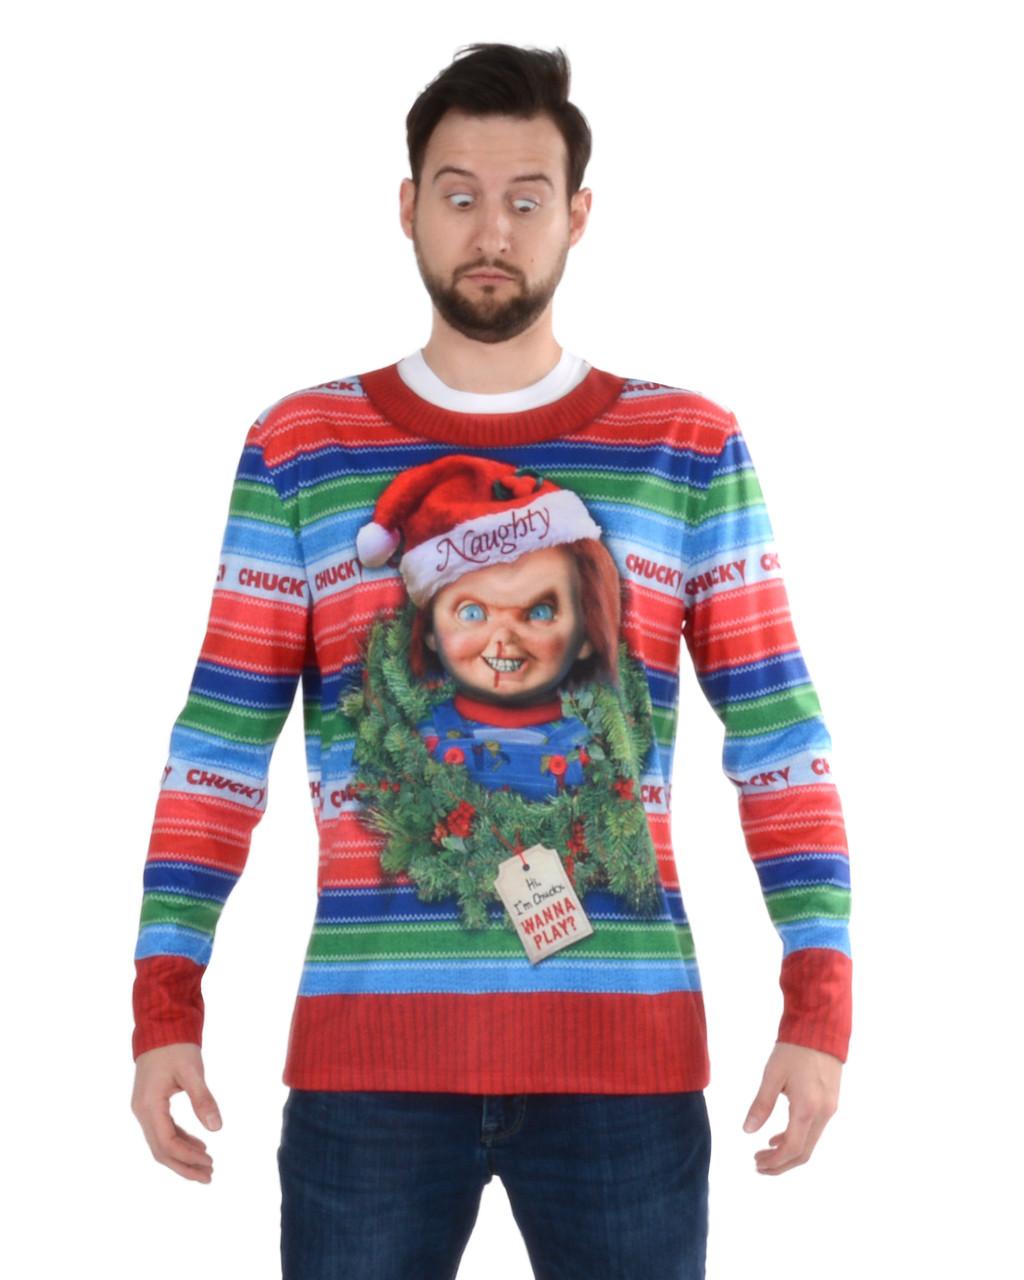 Ugly Christmas Sweater.Chucky Ugly Xmas Sweater